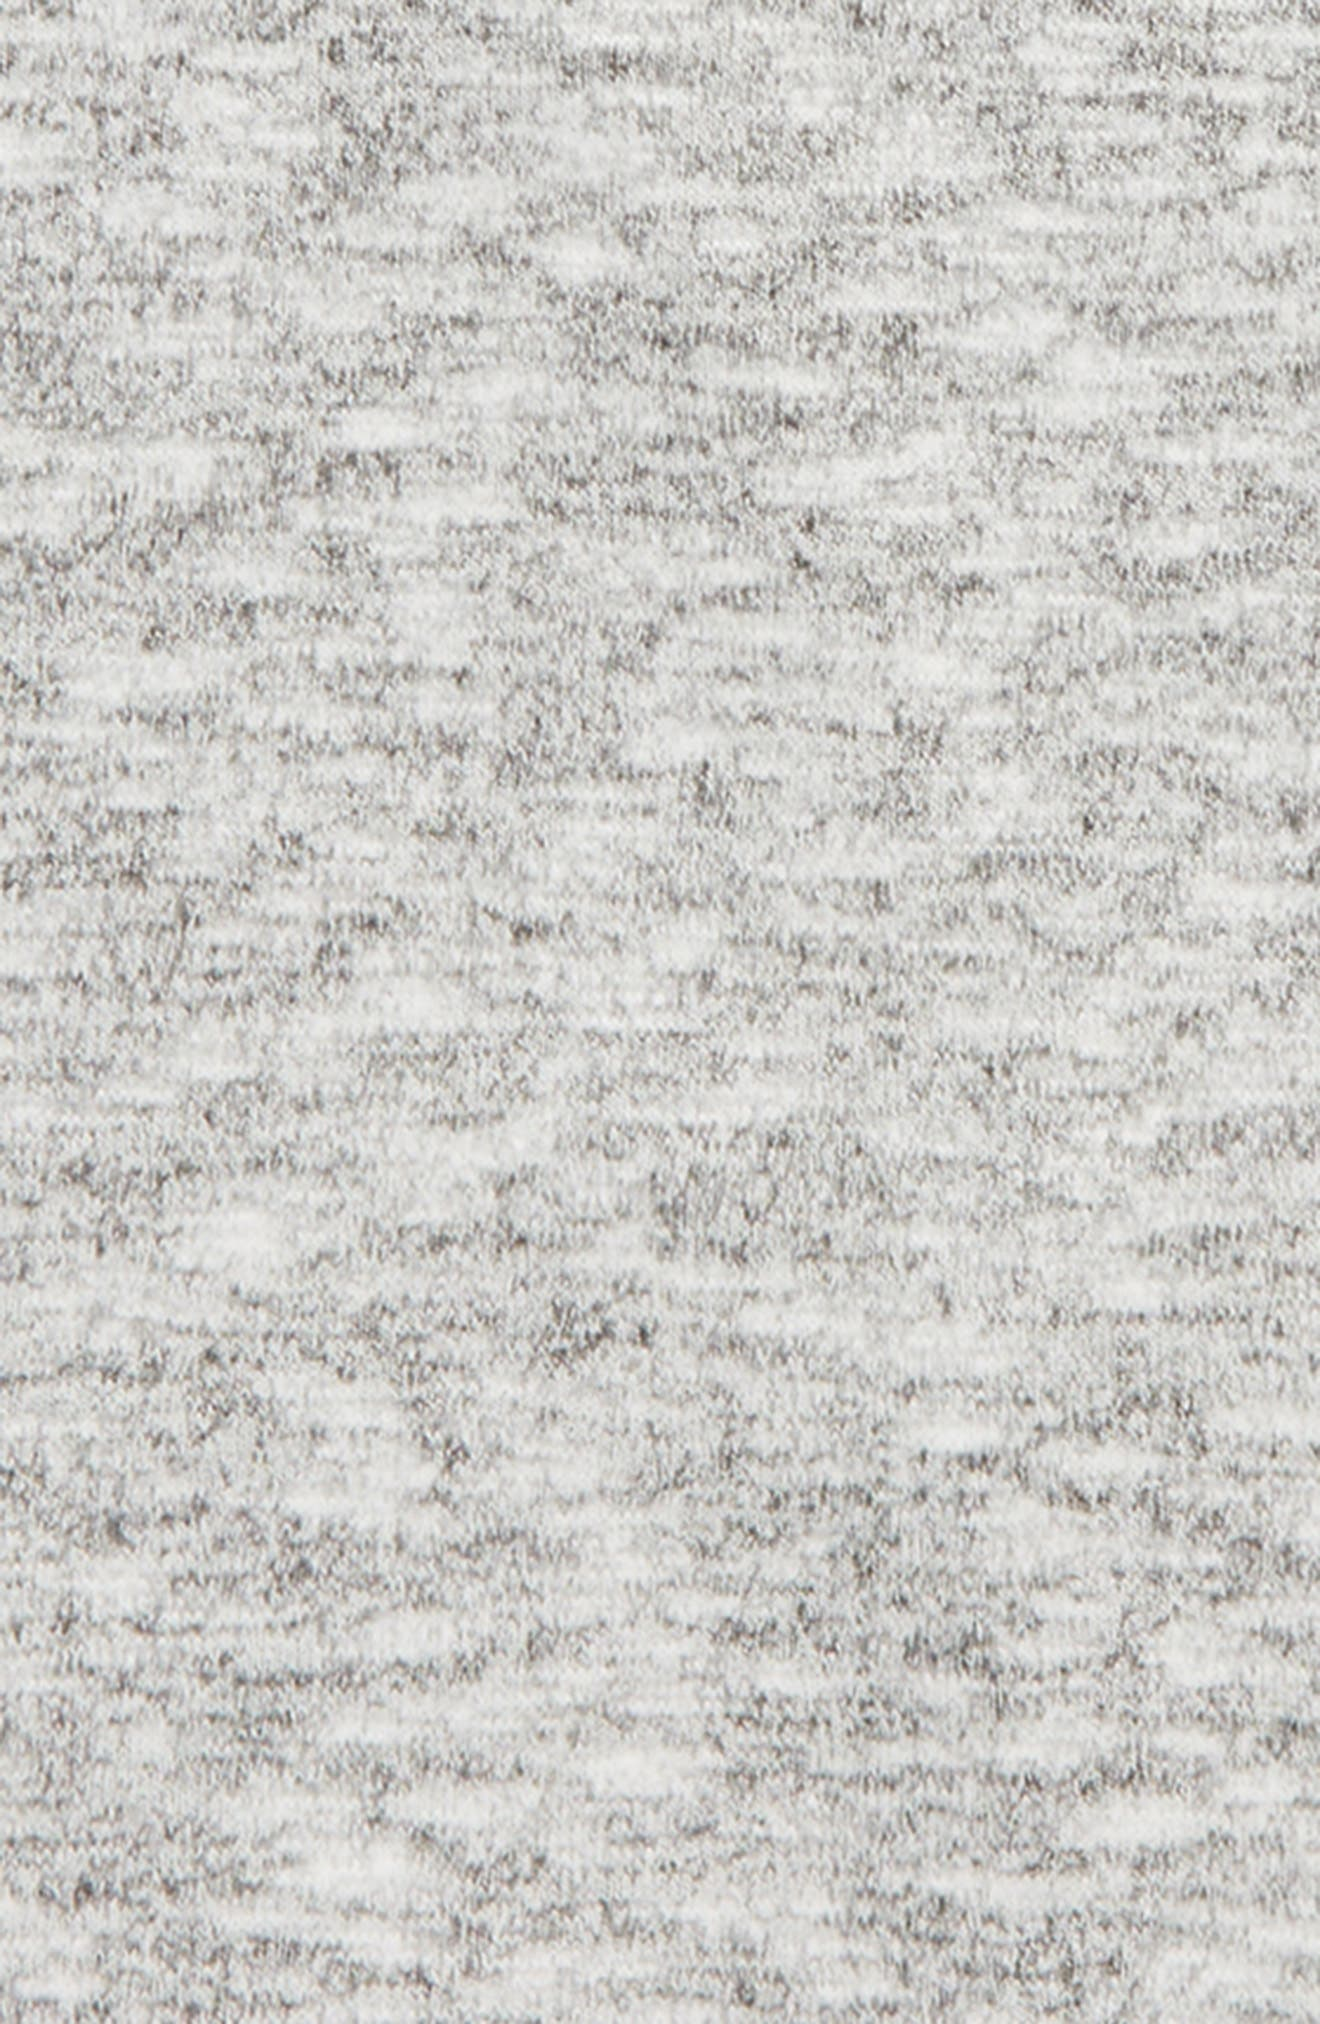 Zella Open Back Sweater,                             Alternate thumbnail 3, color,                             001